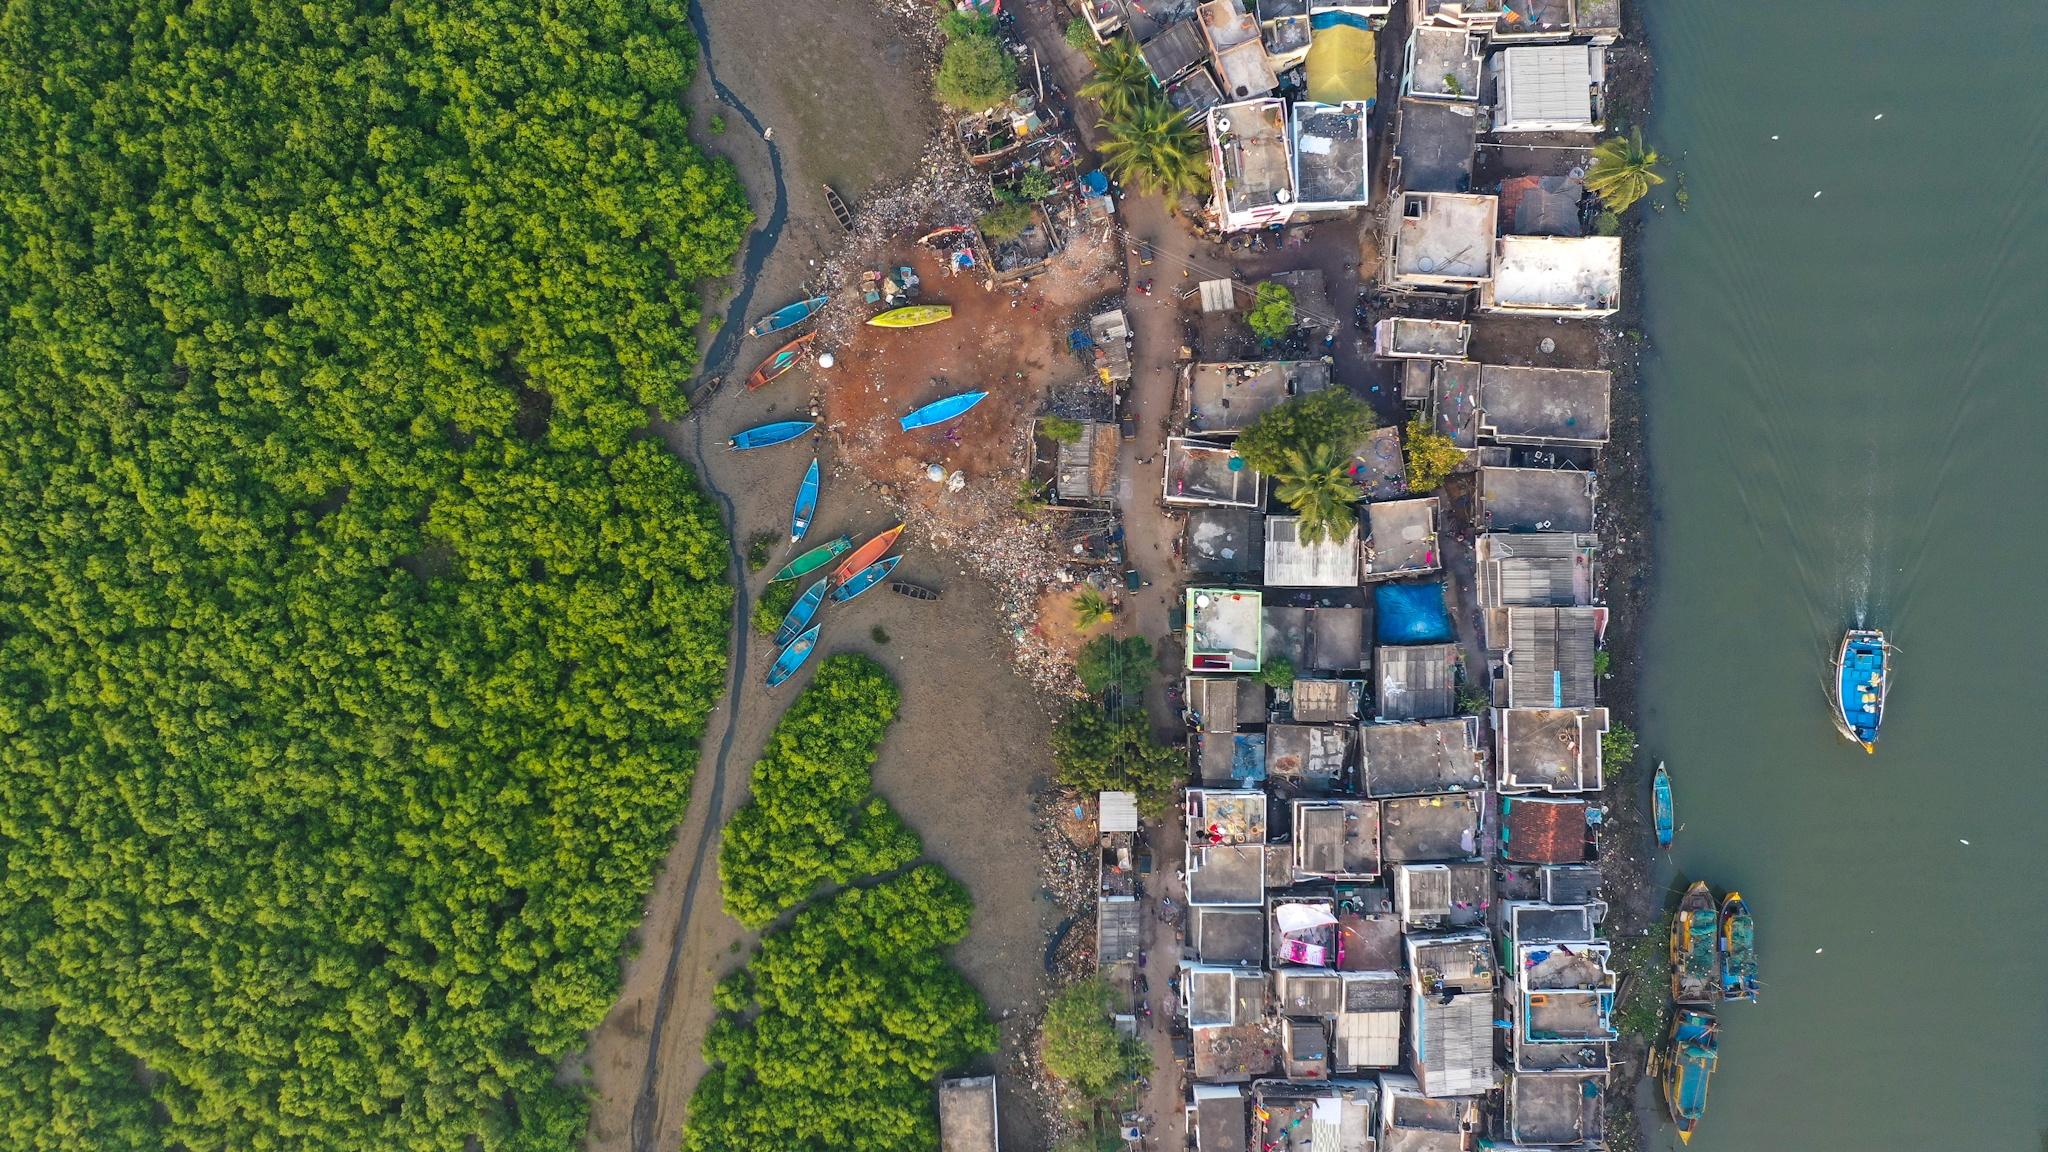 Concrete Jungle - Srikanth Mannepuri, India